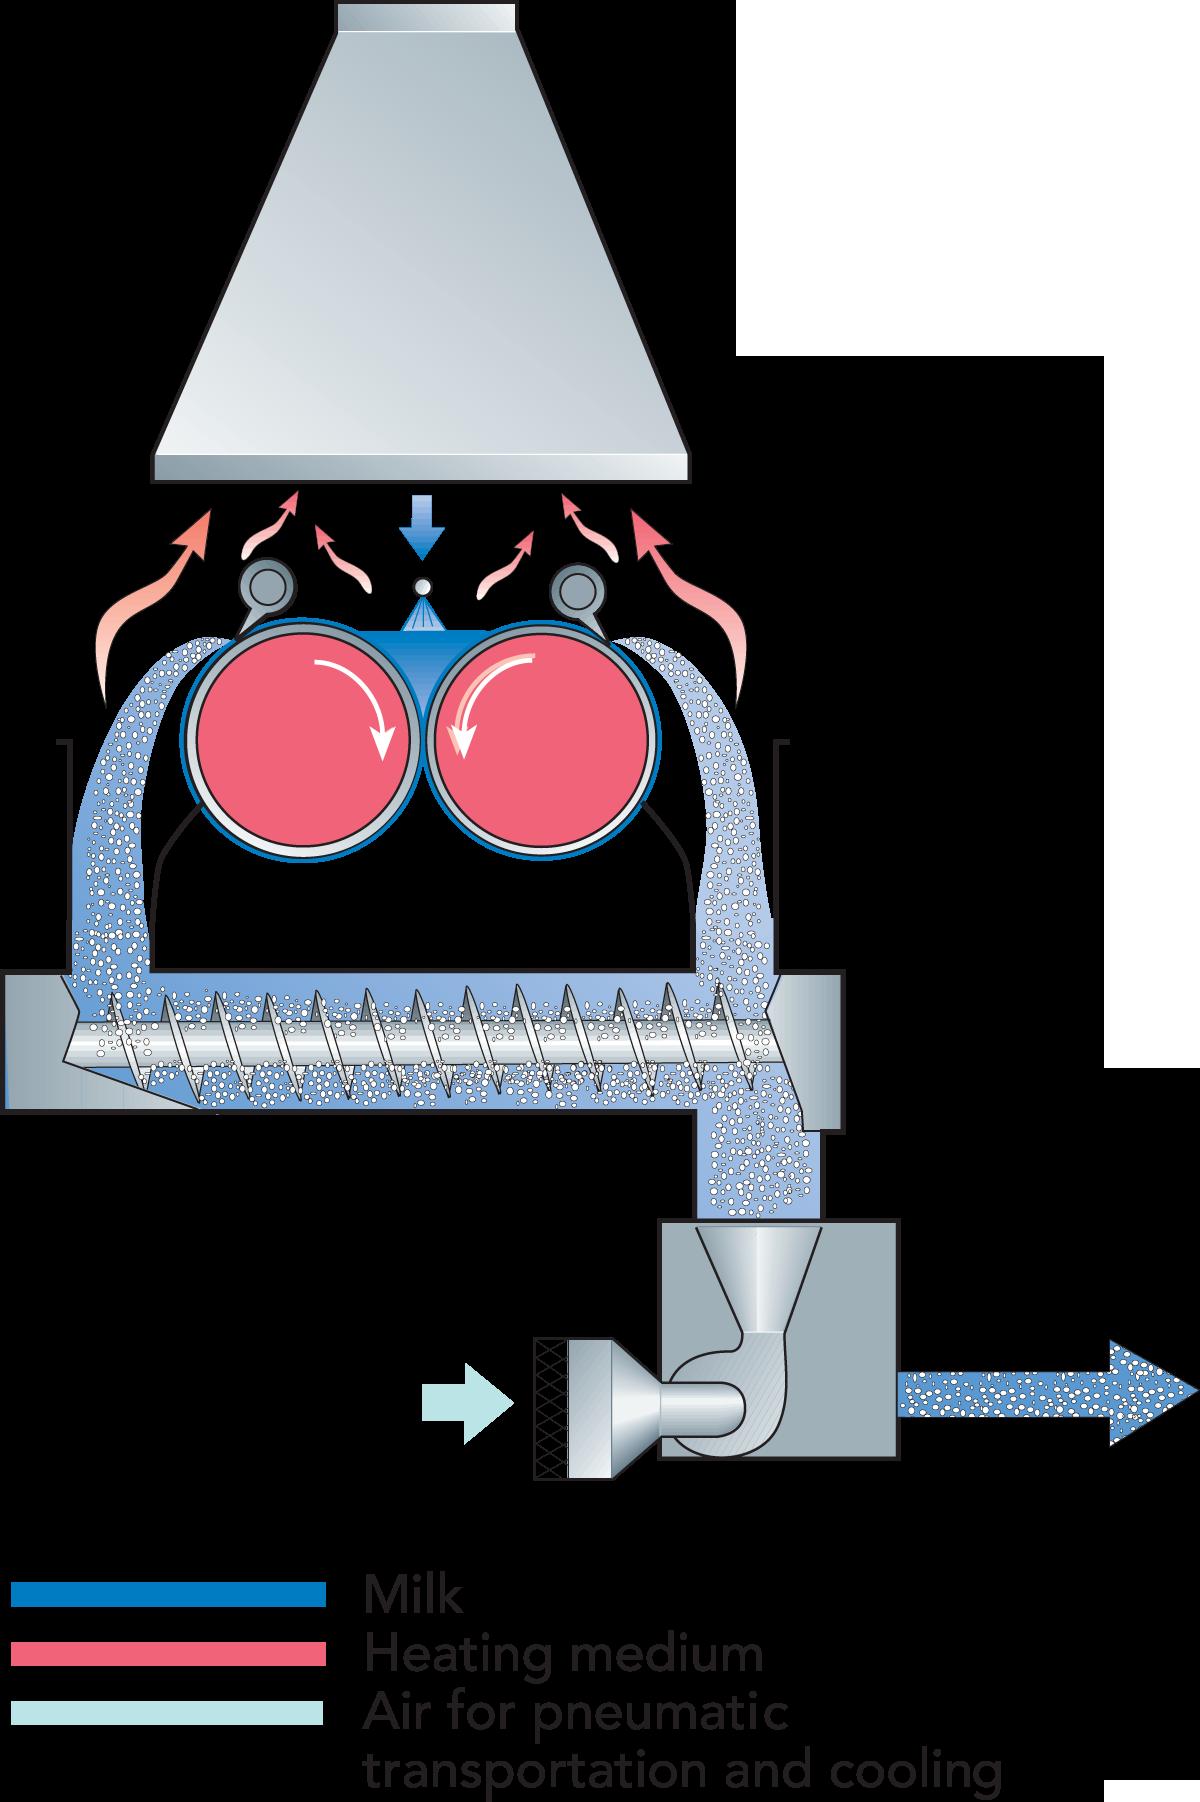 Milk And Whey Powder Dairy Processing Handbook Vacuum Technique For Development Of Primary Standard Zoom